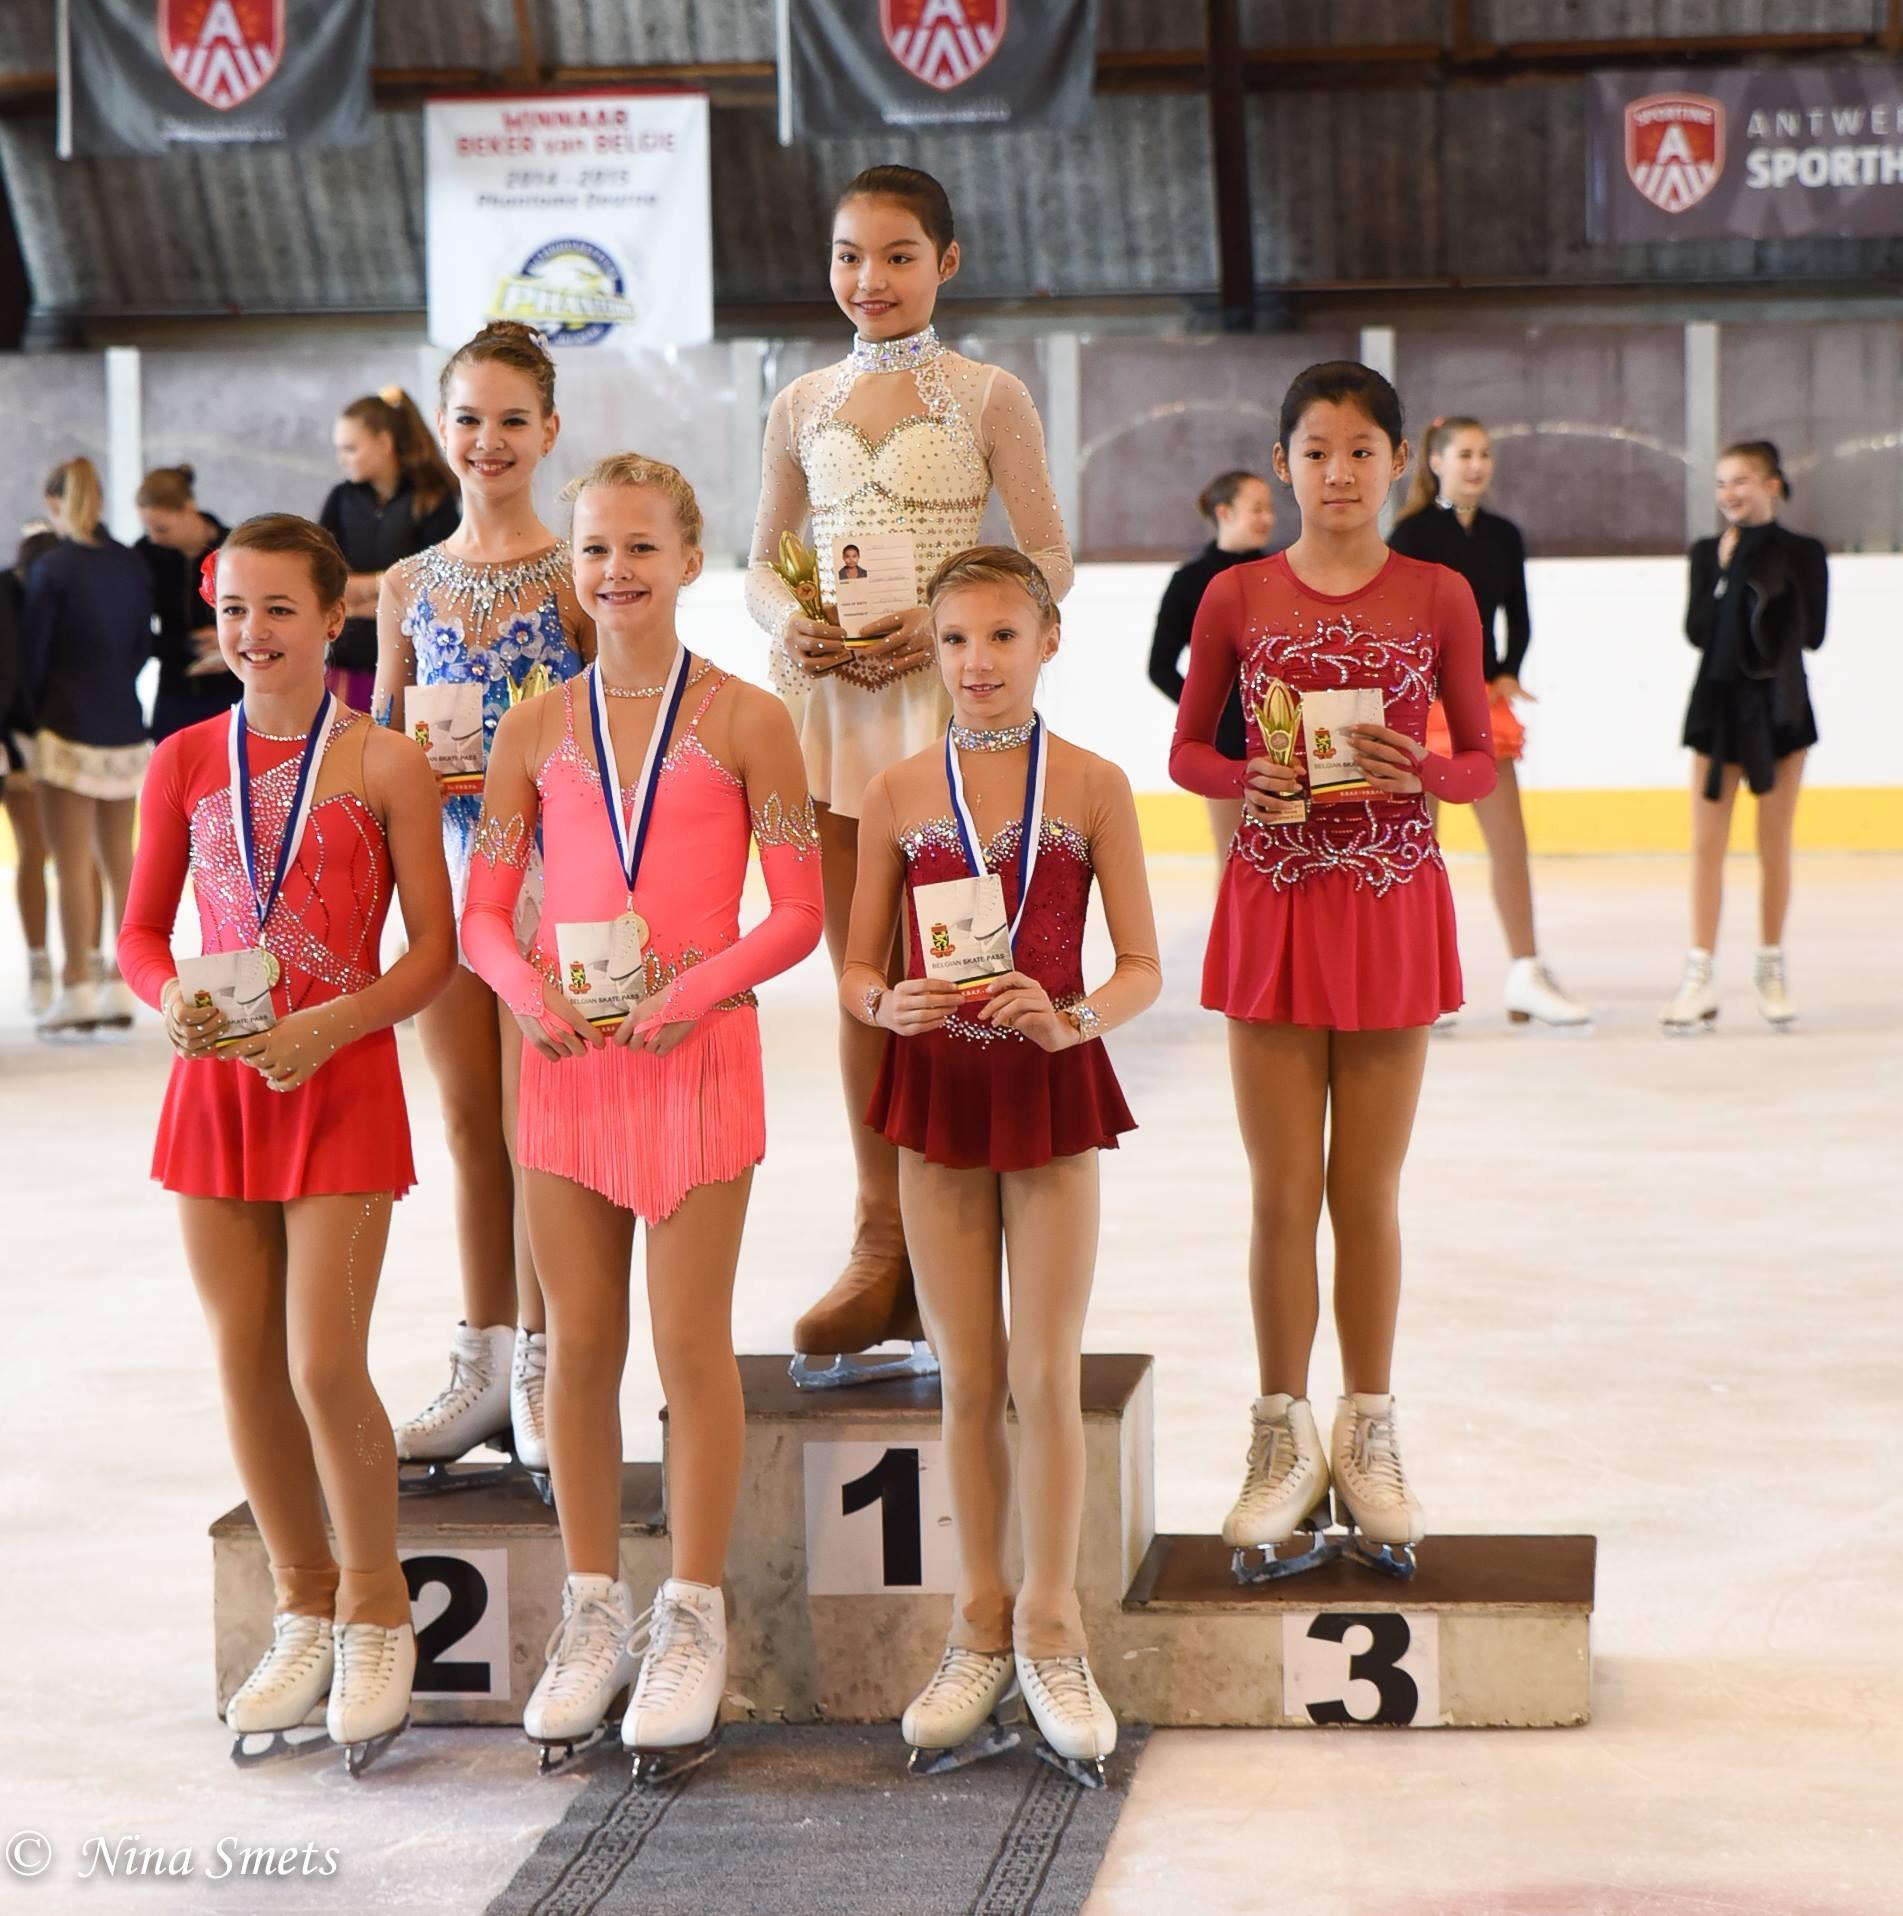 Rivierencup 2de plaats A 2017